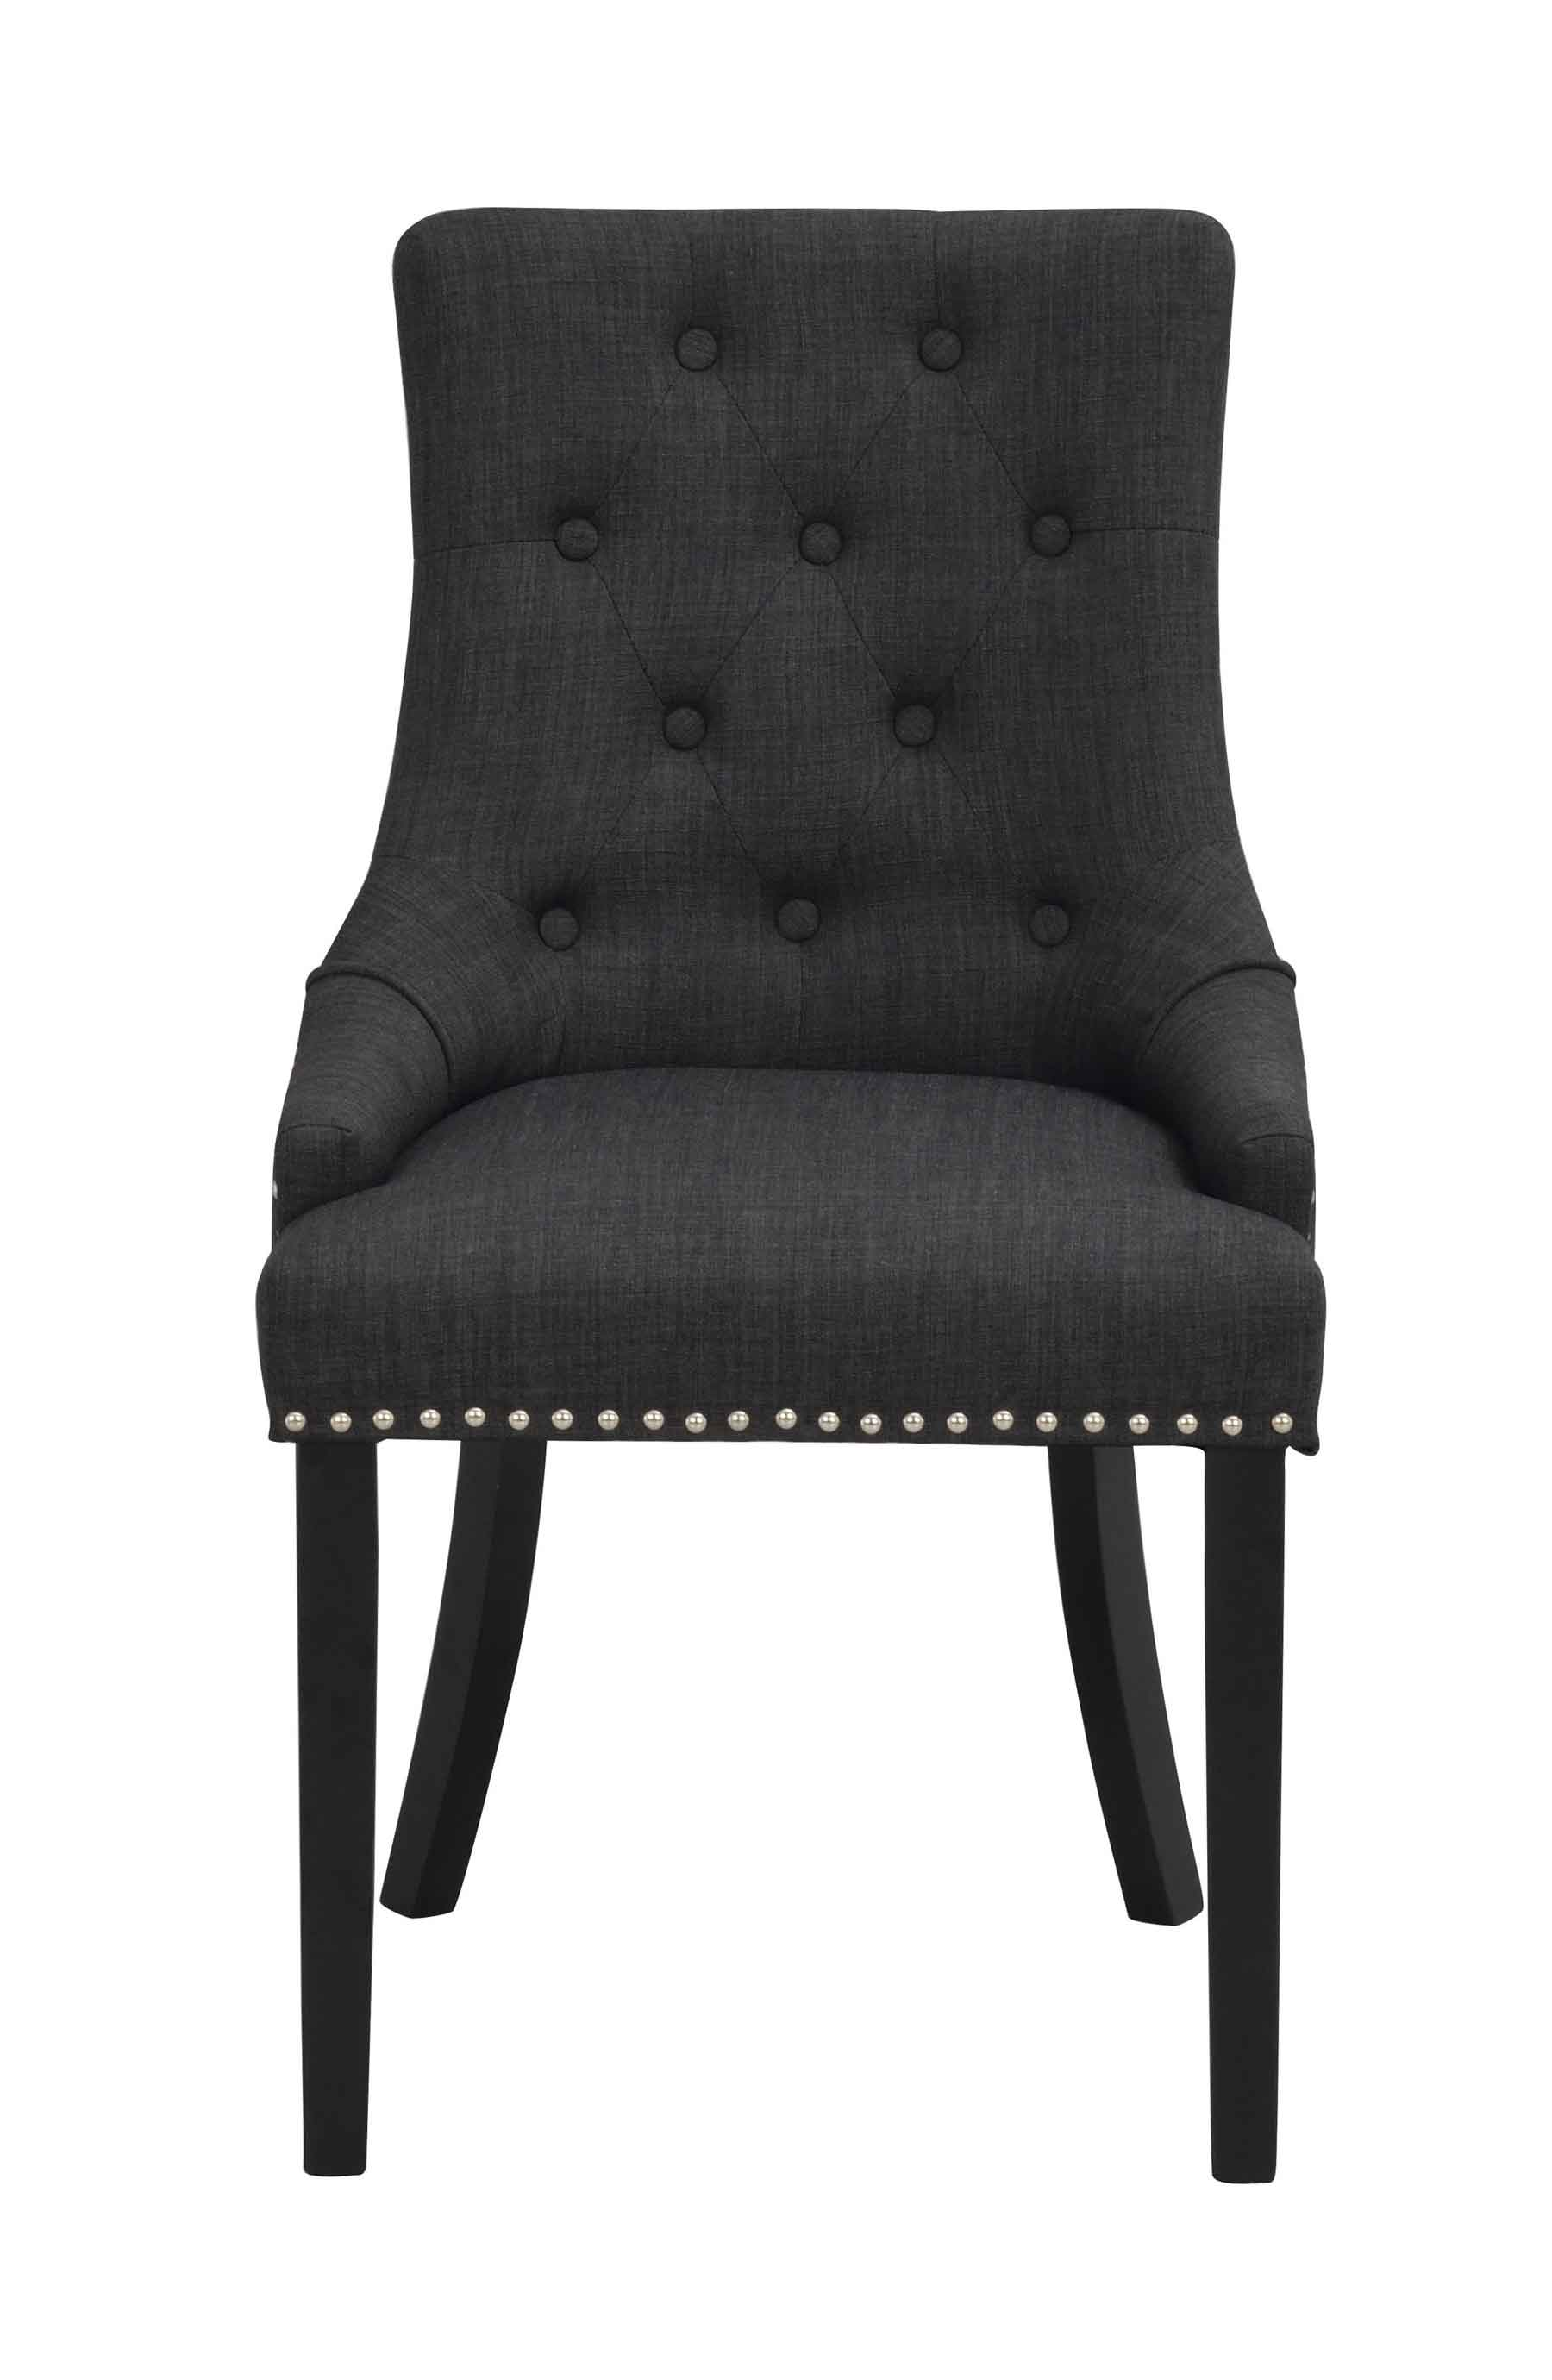 ROWICO Vicky spisebordsstol - antracitgråt stof/sorte træben